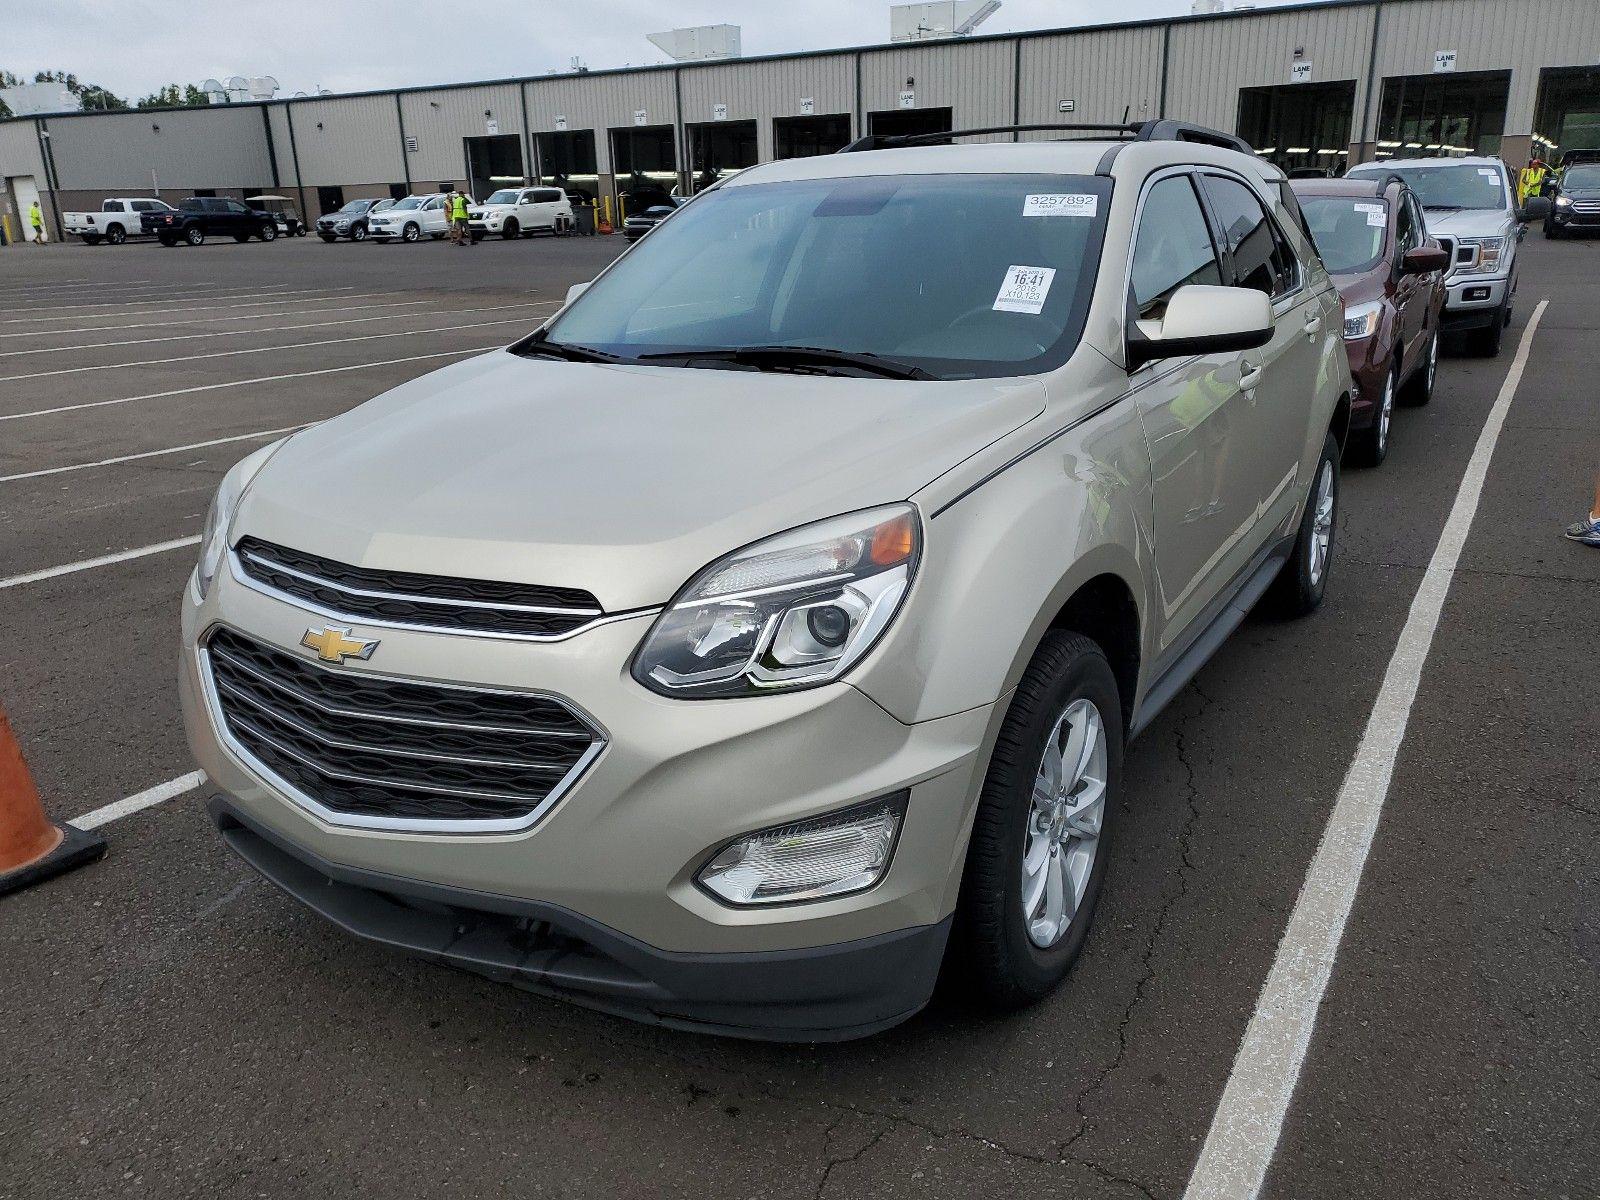 2016 Chevrolet Equinox 2.4. Lot 99913908540 Vin 2GNALCEK1G1174351